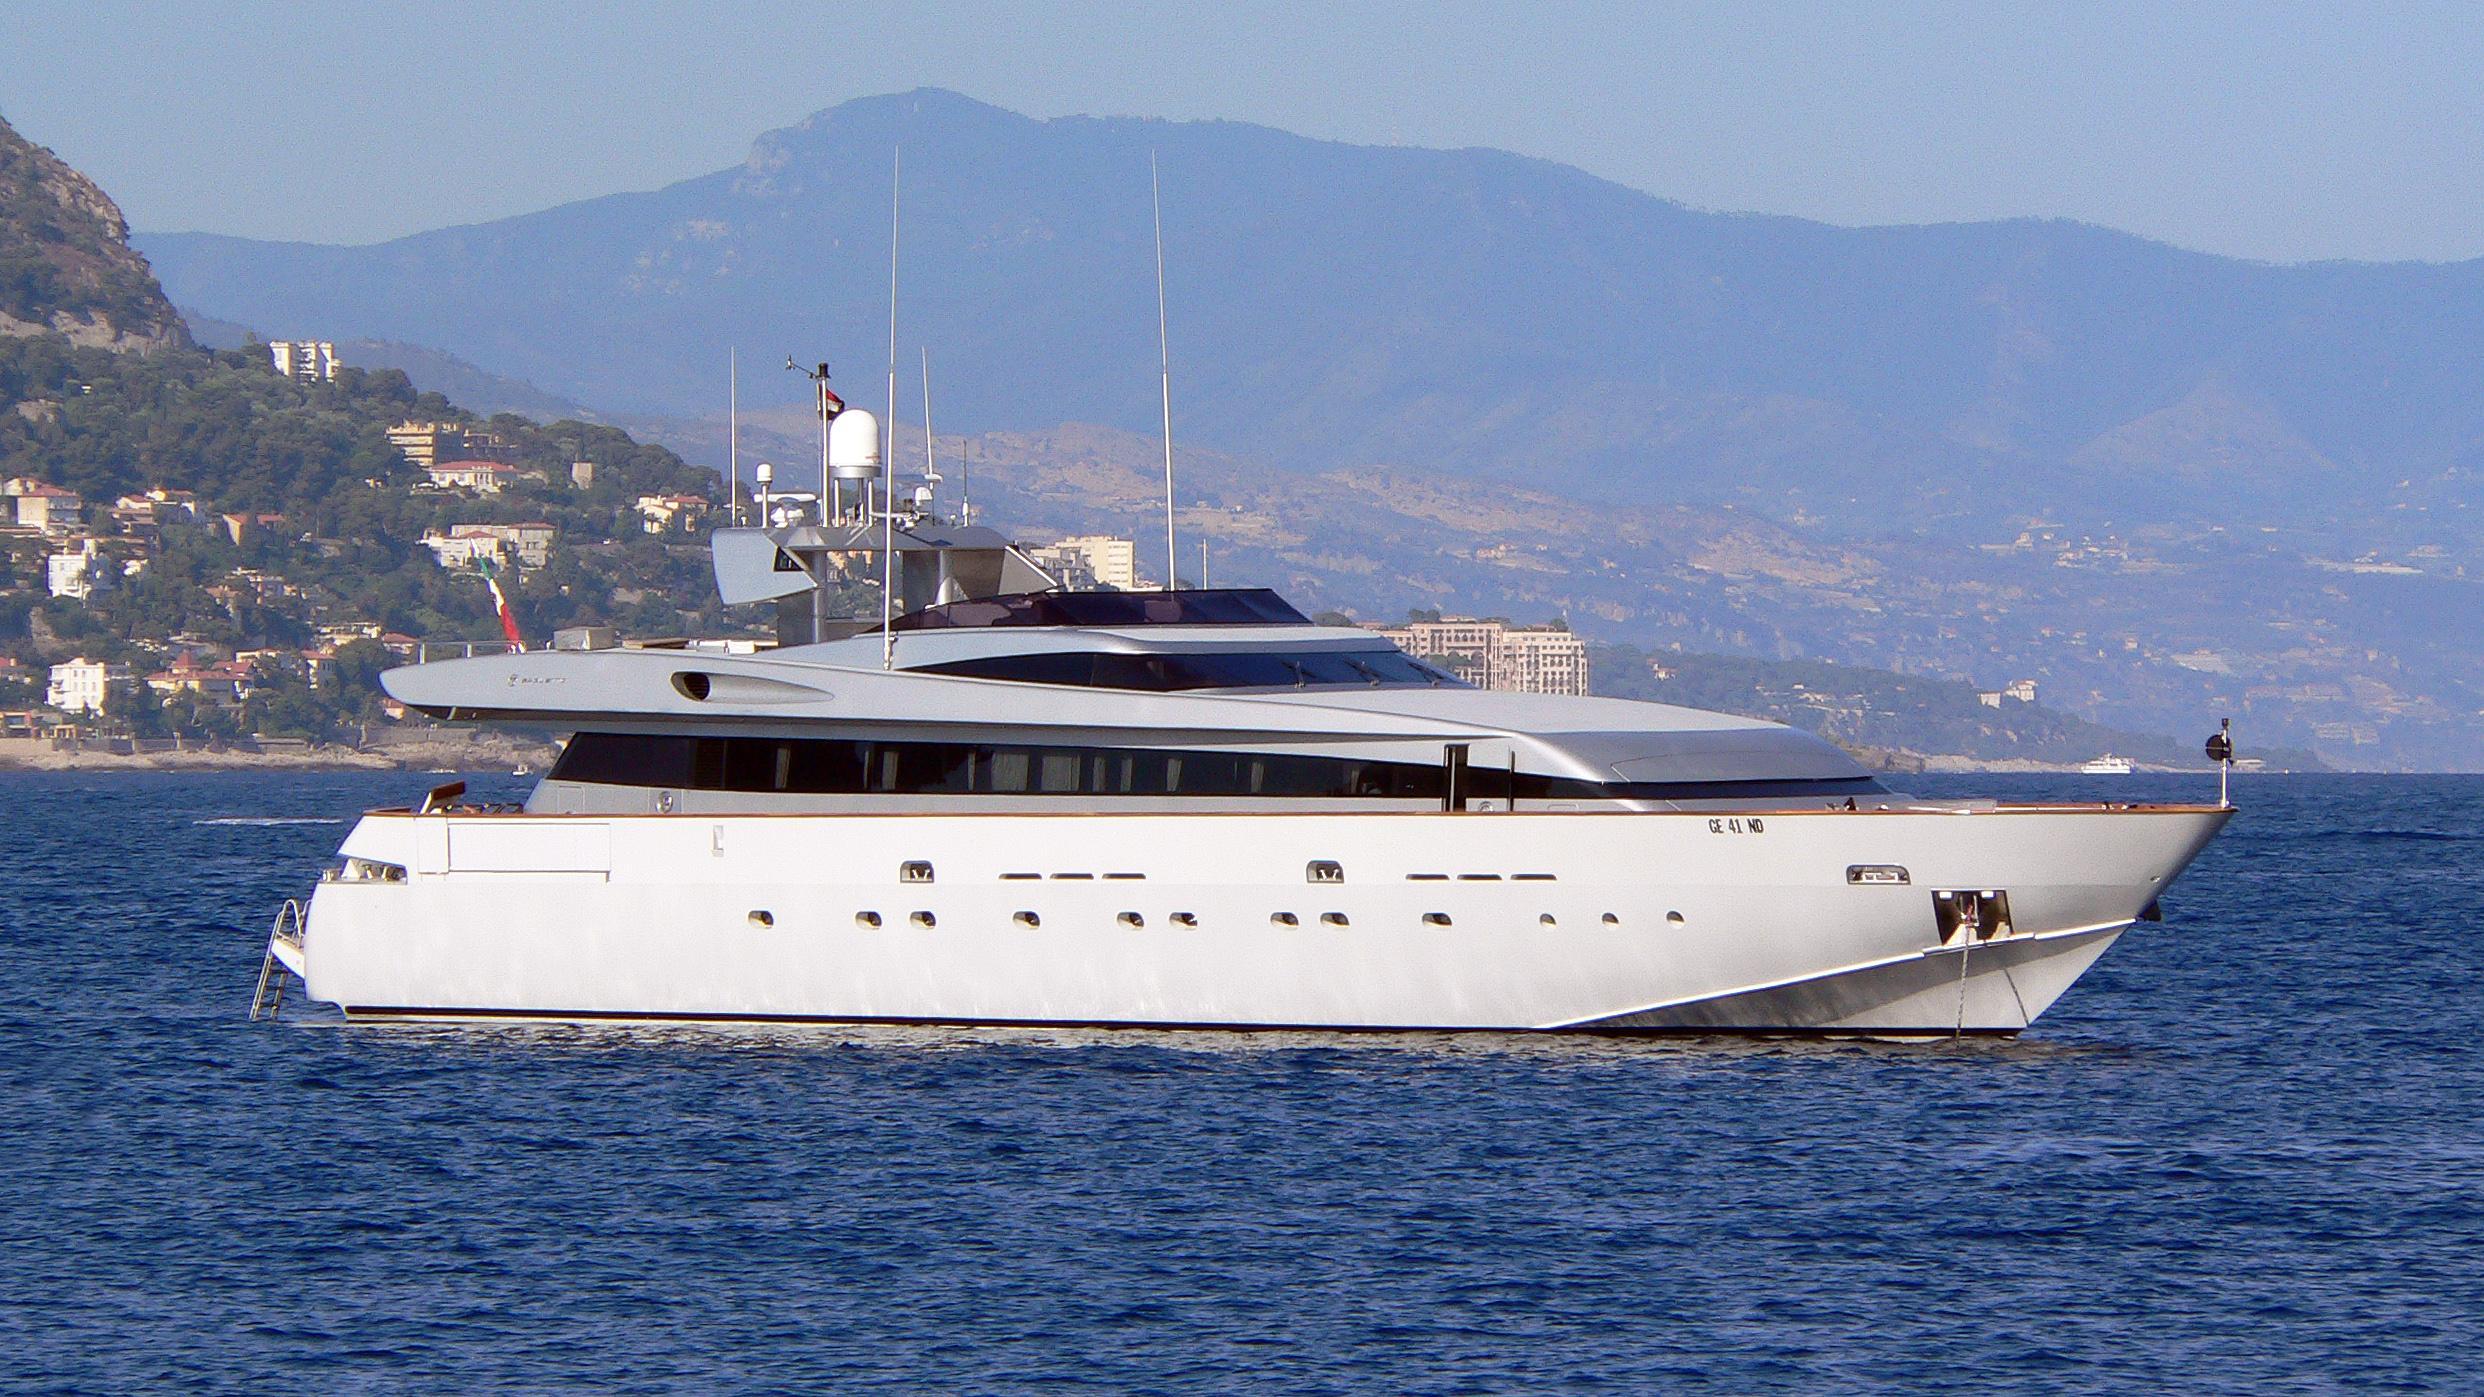 thunderball-motor-yacht-baglietto-2001§-34m-half-profile-before-refit